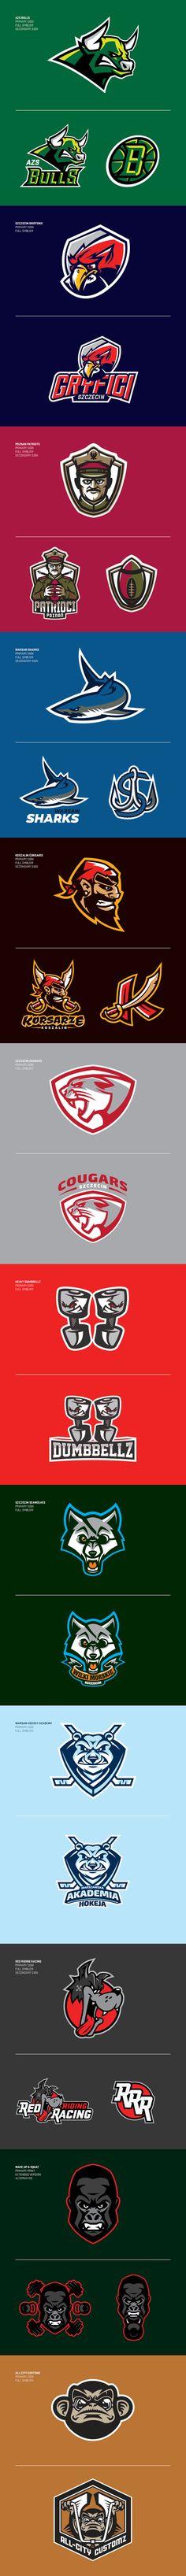 Akuma101 - Sports Branding Pack